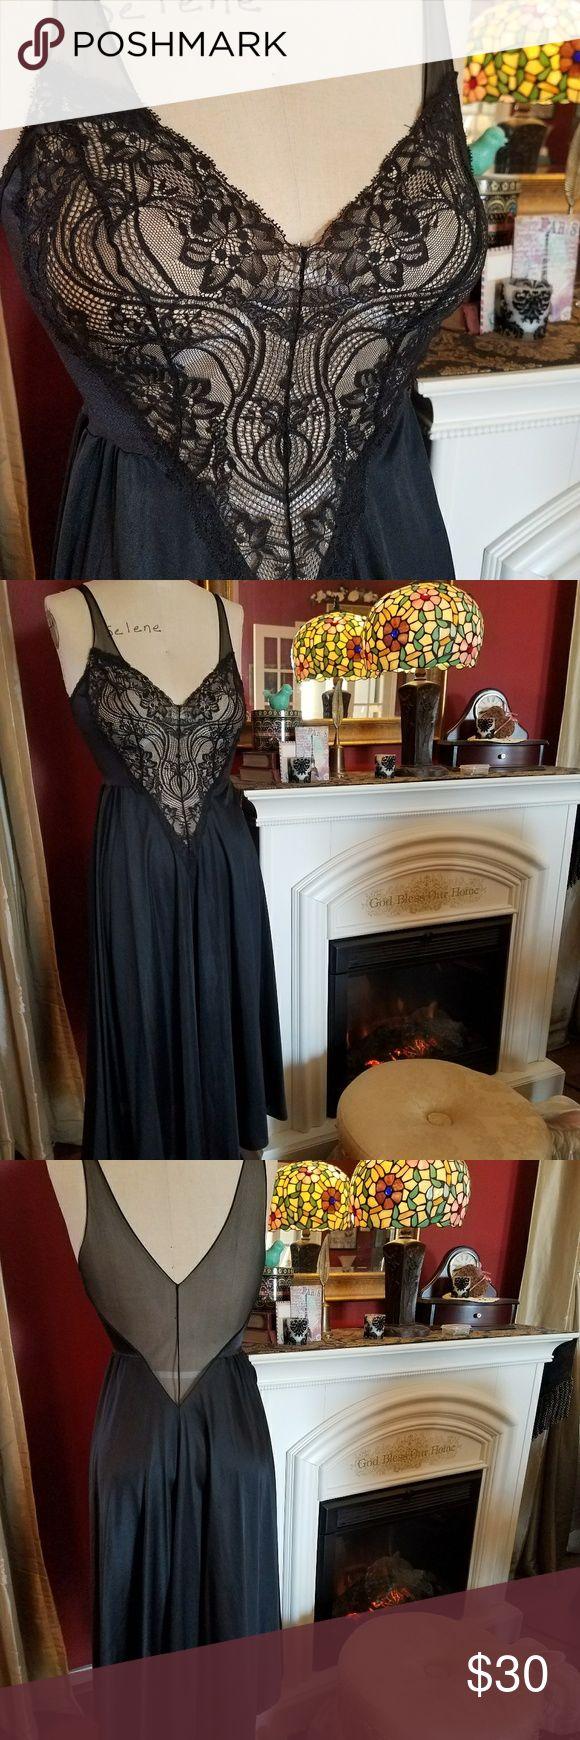 Black Nylon & Lace Gown Black Lace Top with black nylon skirt lingerie. Brand is Olga. Vintage Intimates & Sleepwear